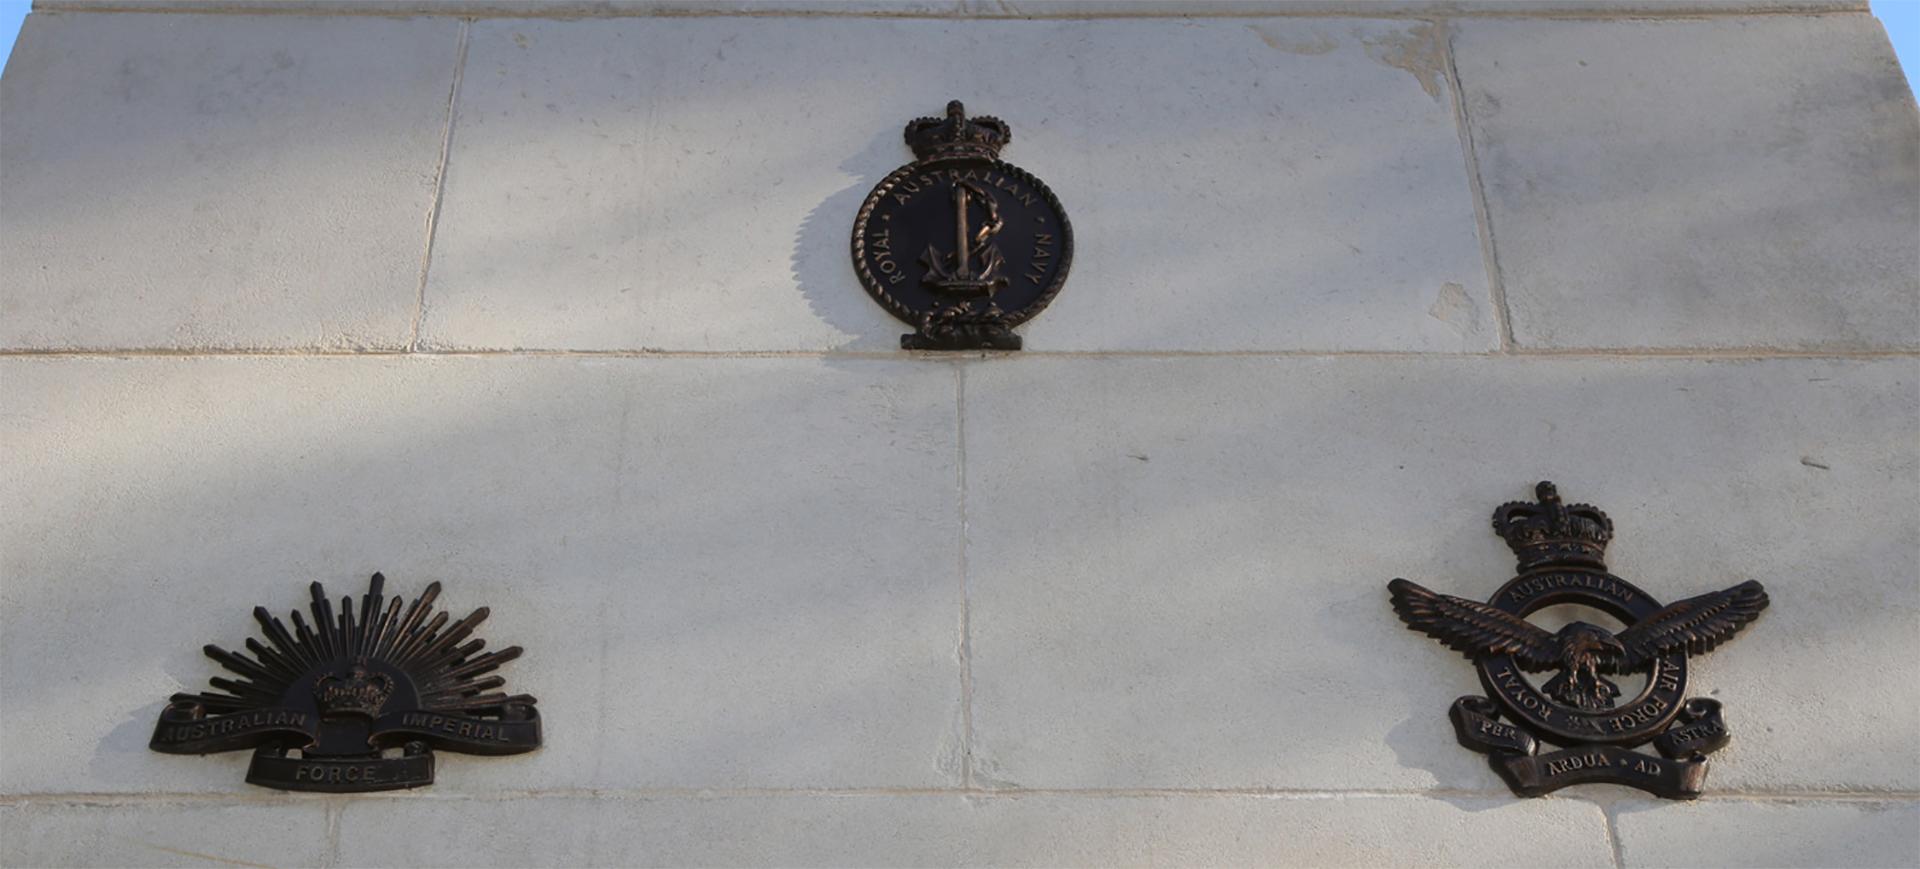 Gosford Cenotaph, close-up of service branch emblems